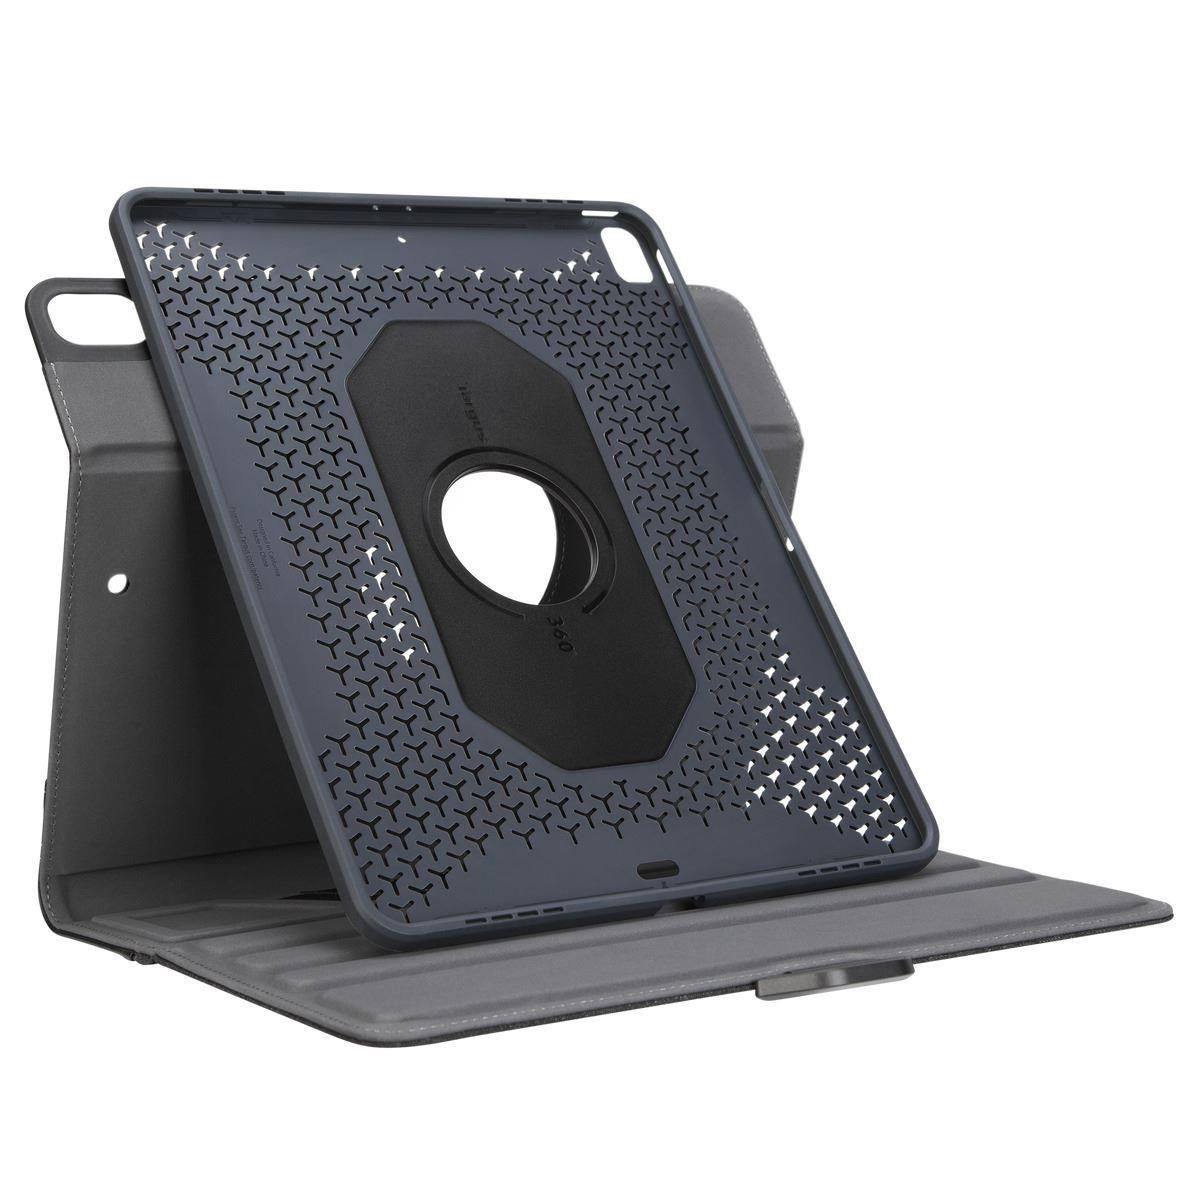 Targus VersaVu Signature Case (Black) for Apple iPad Pro (12.9 inch)